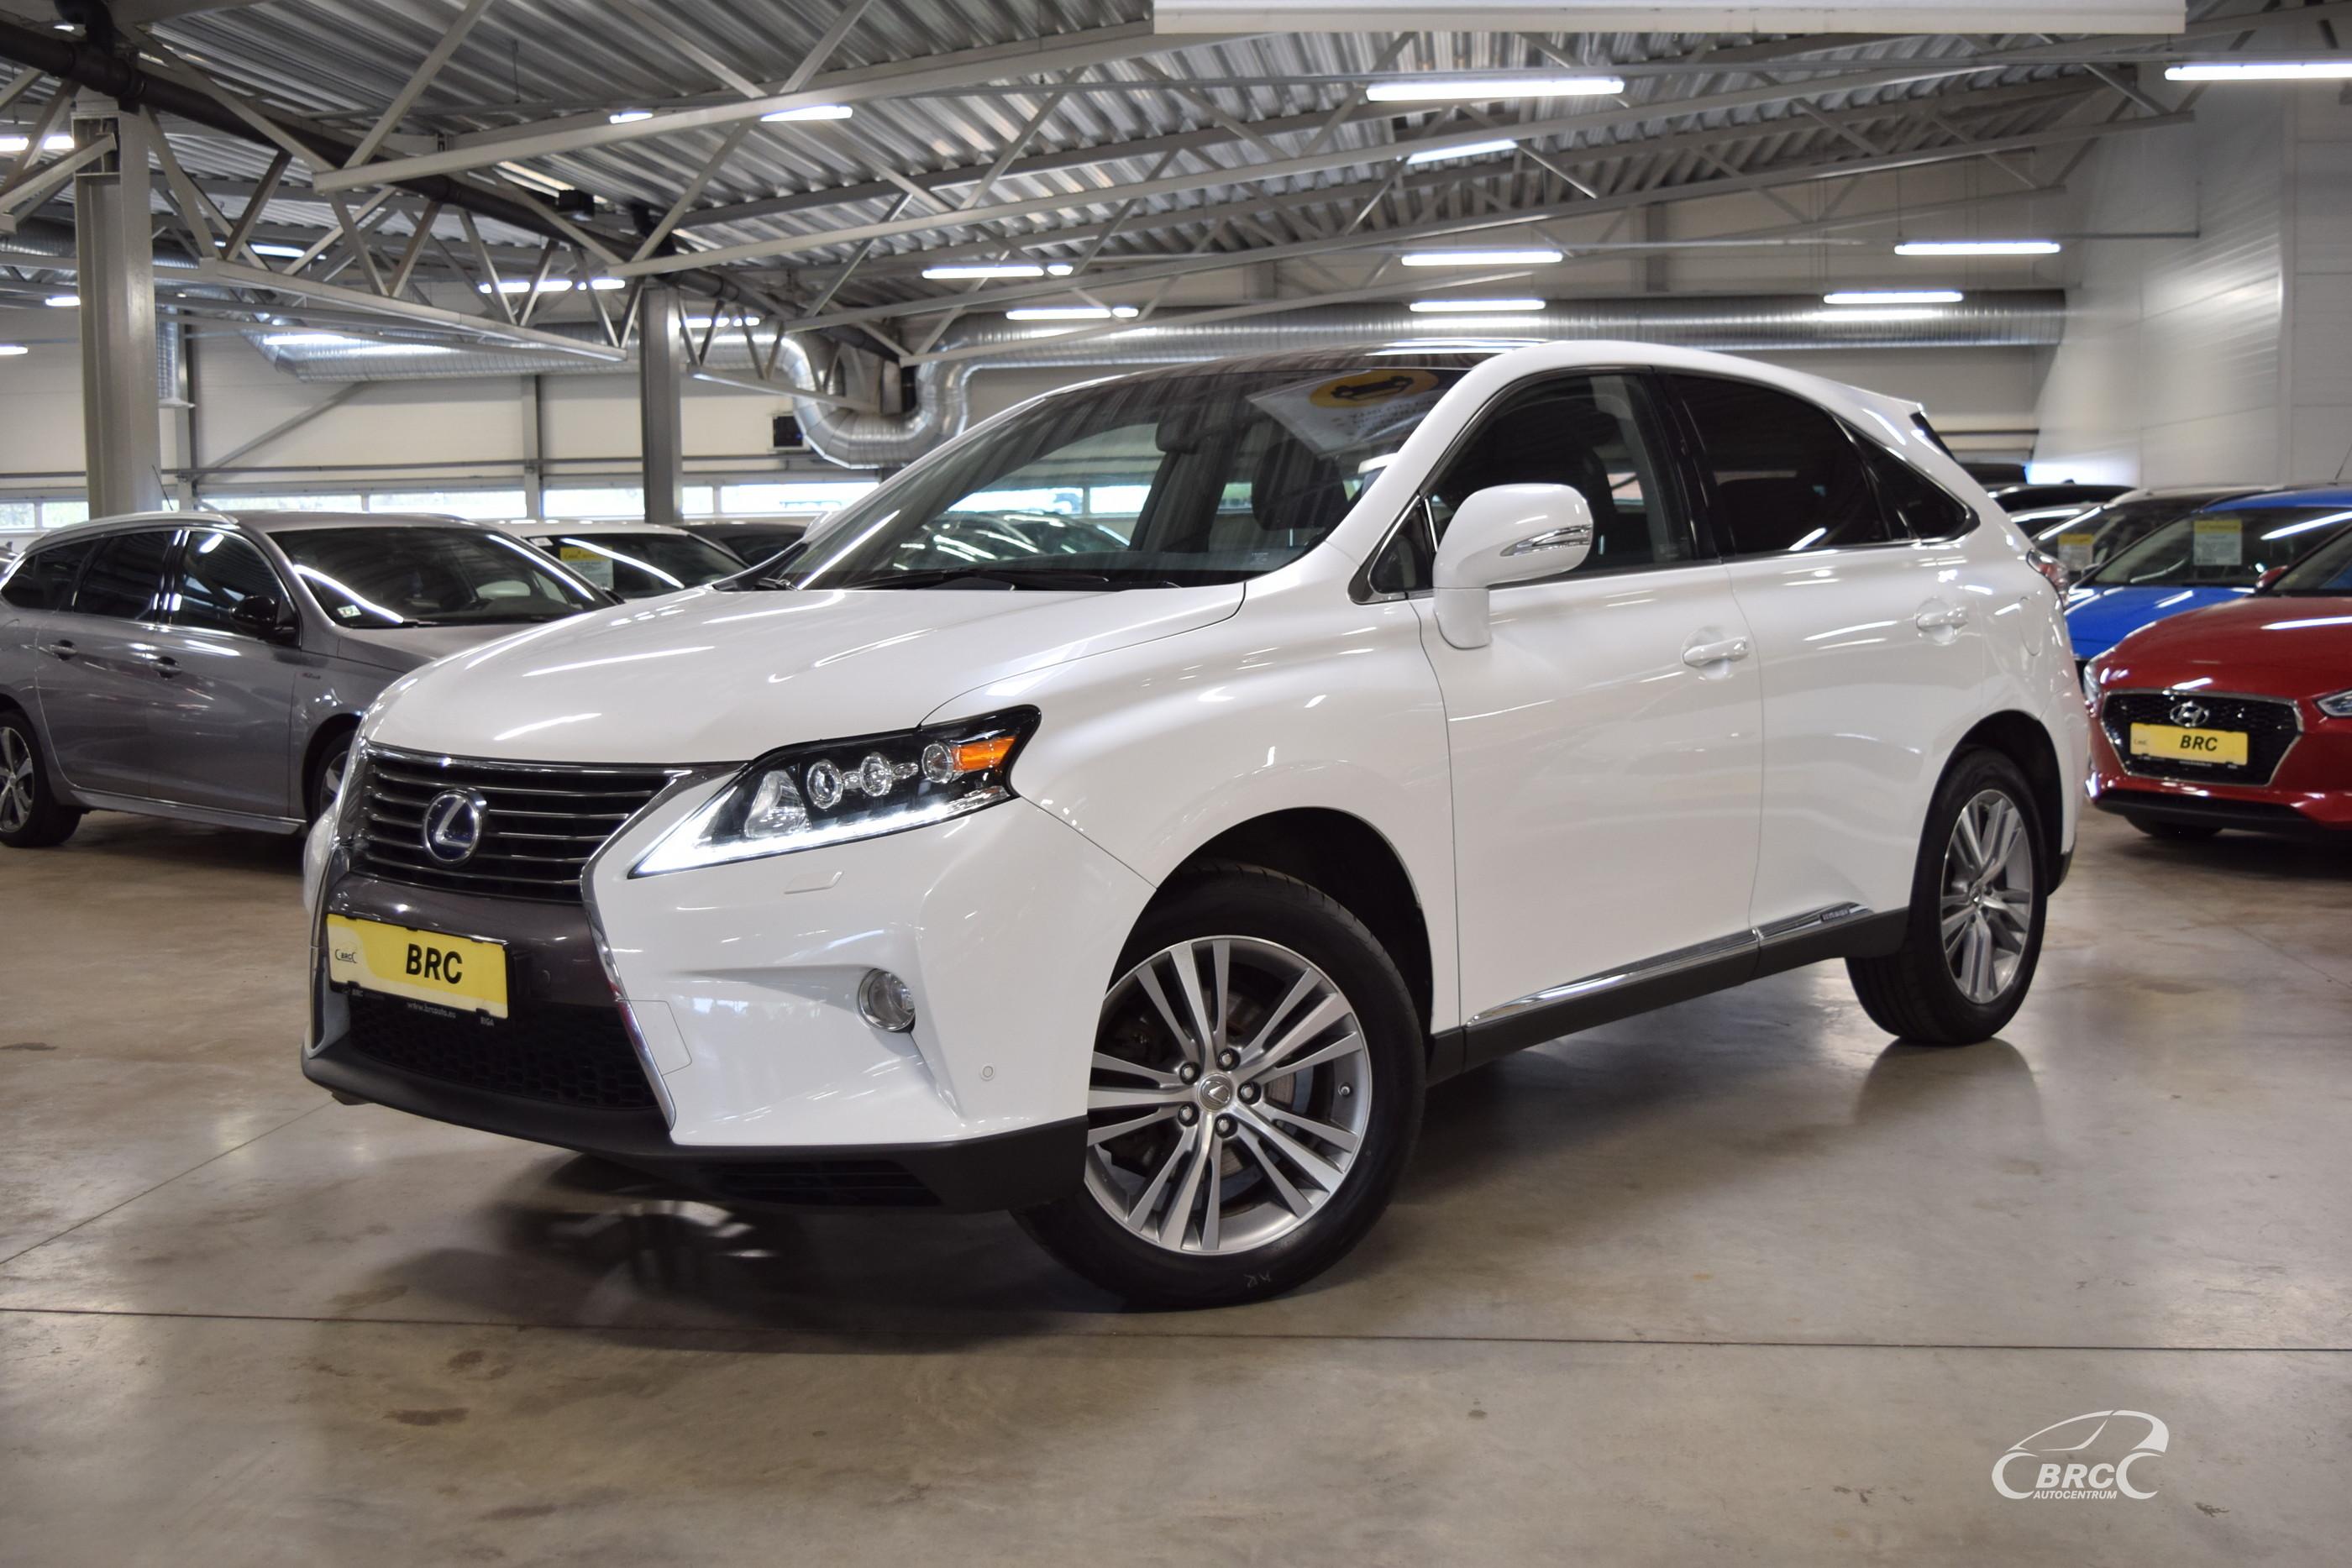 Lexus RX 450 Hybrid